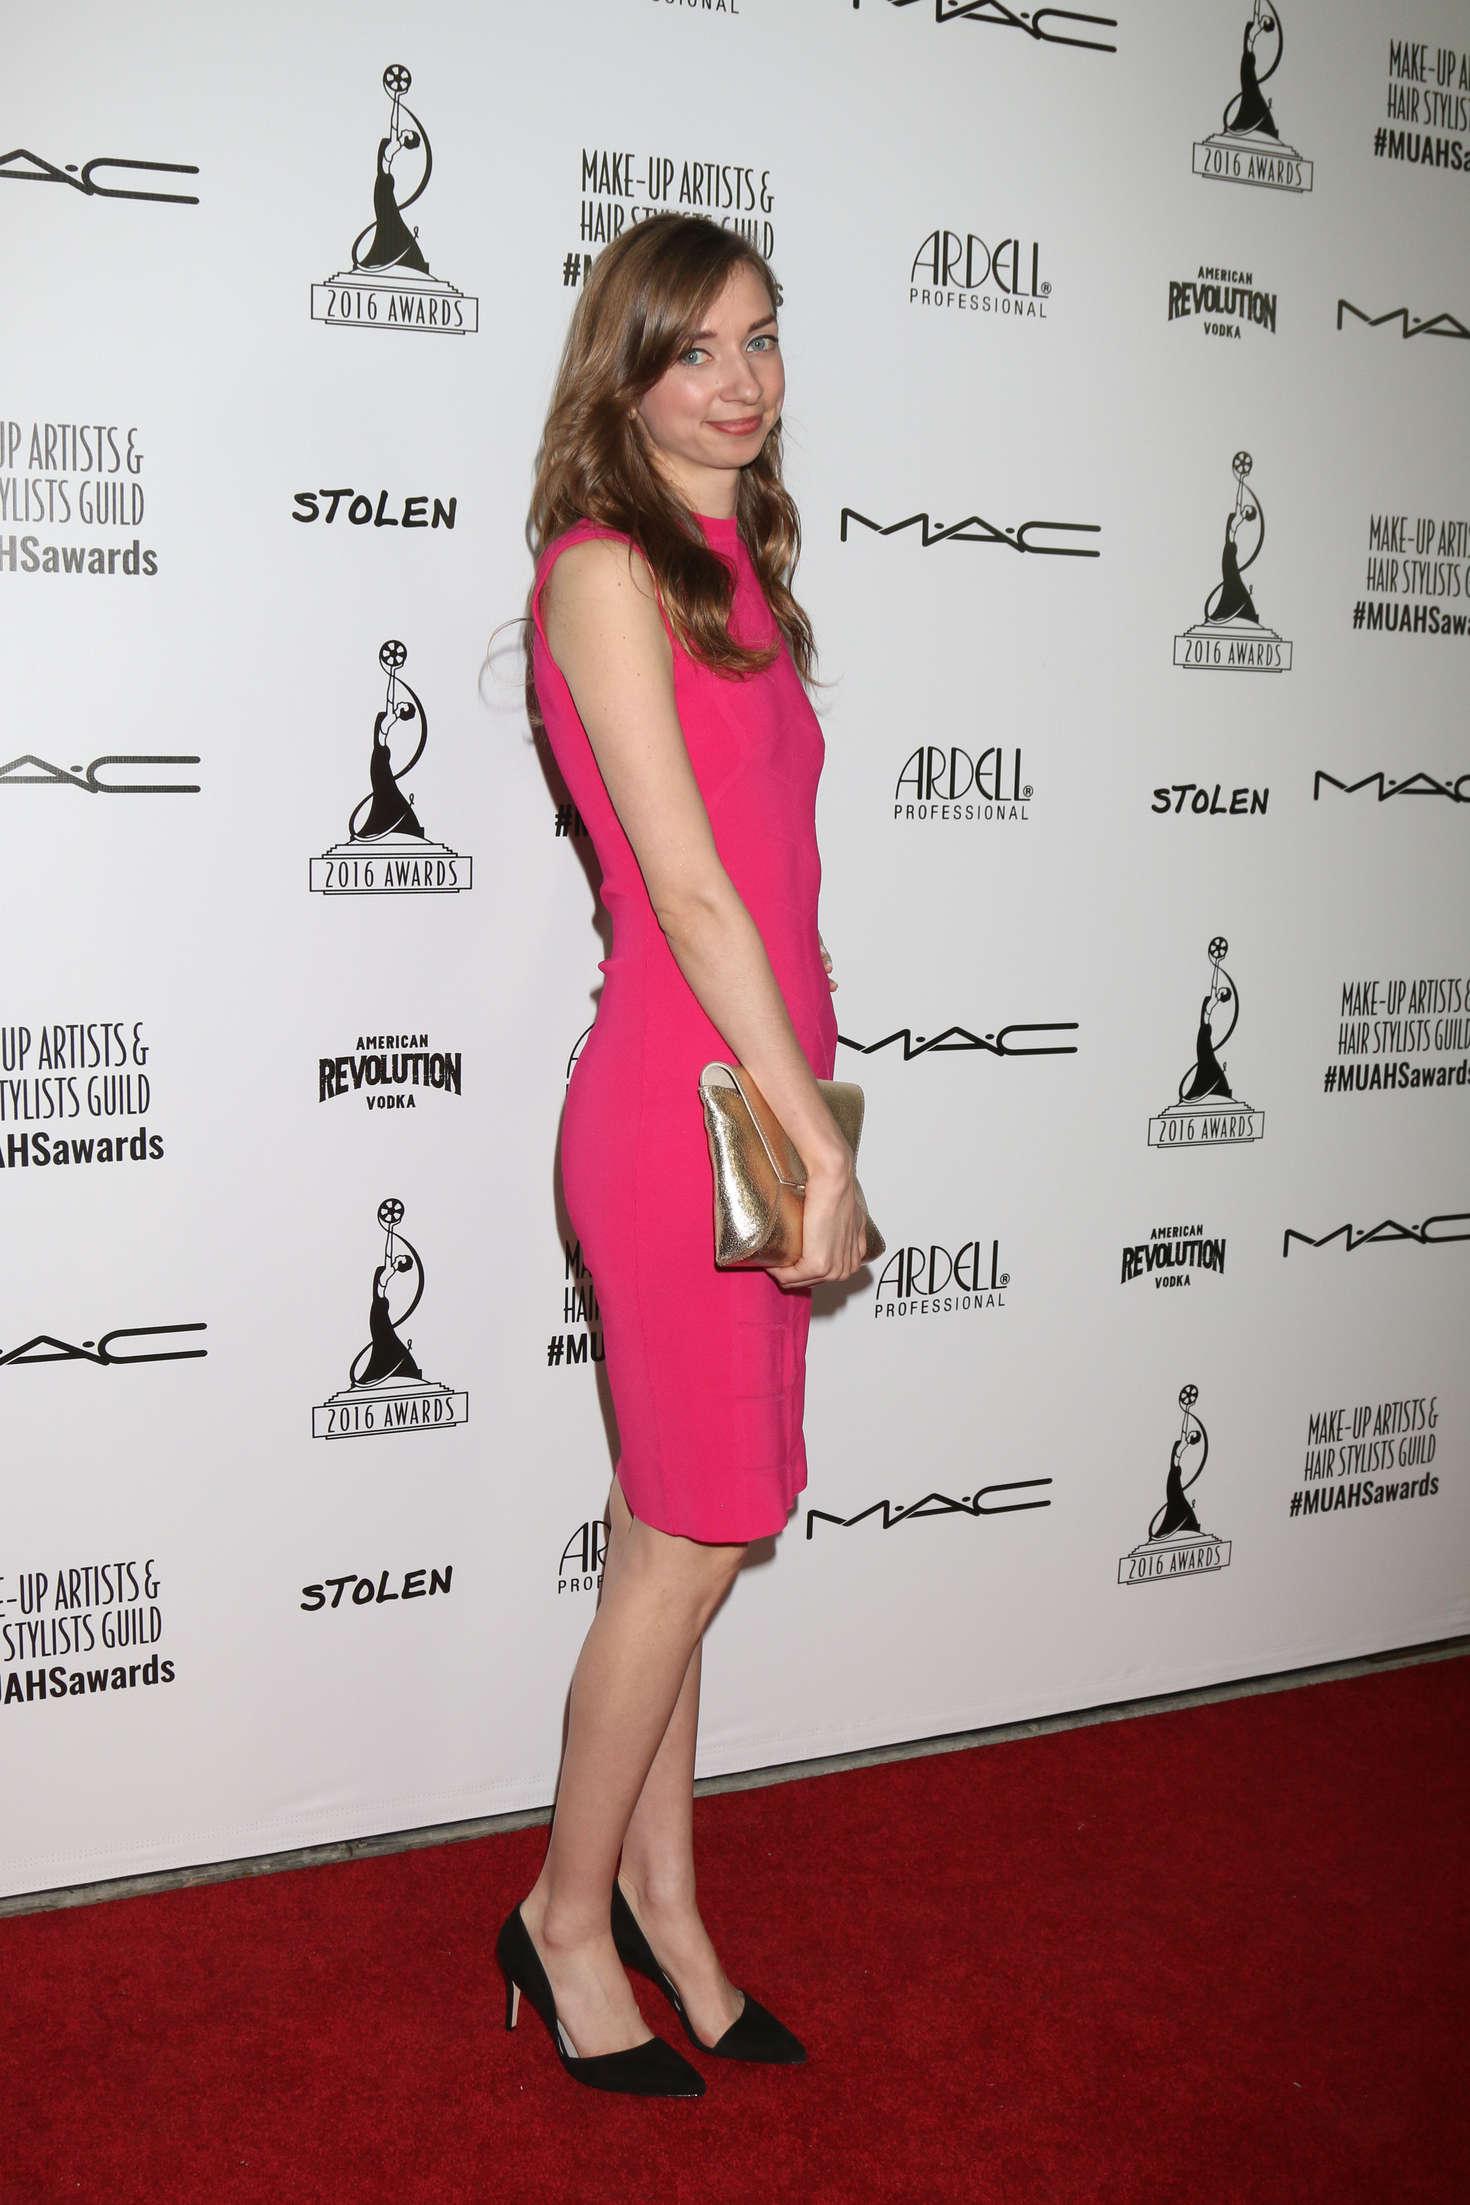 Lauren Lapkus Make-Up Artist and Hair Stylist Guild Awards in Los Angeles